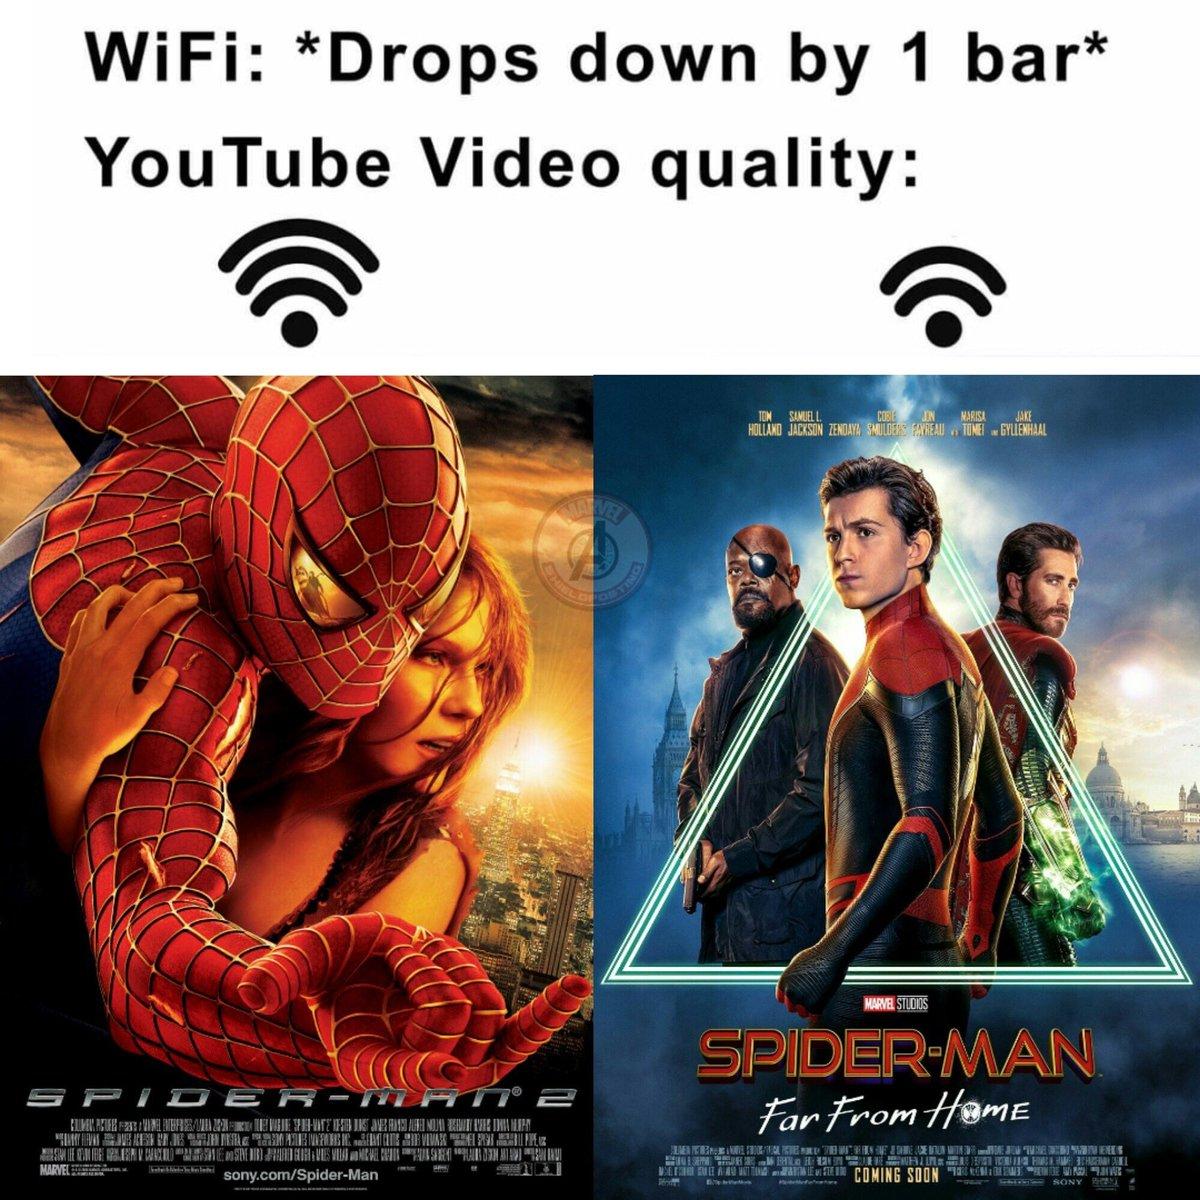 Have at it MCU stans. #spiderman #SpiderManFarFromTheMCU <br>http://pic.twitter.com/fsXXf0mN7T